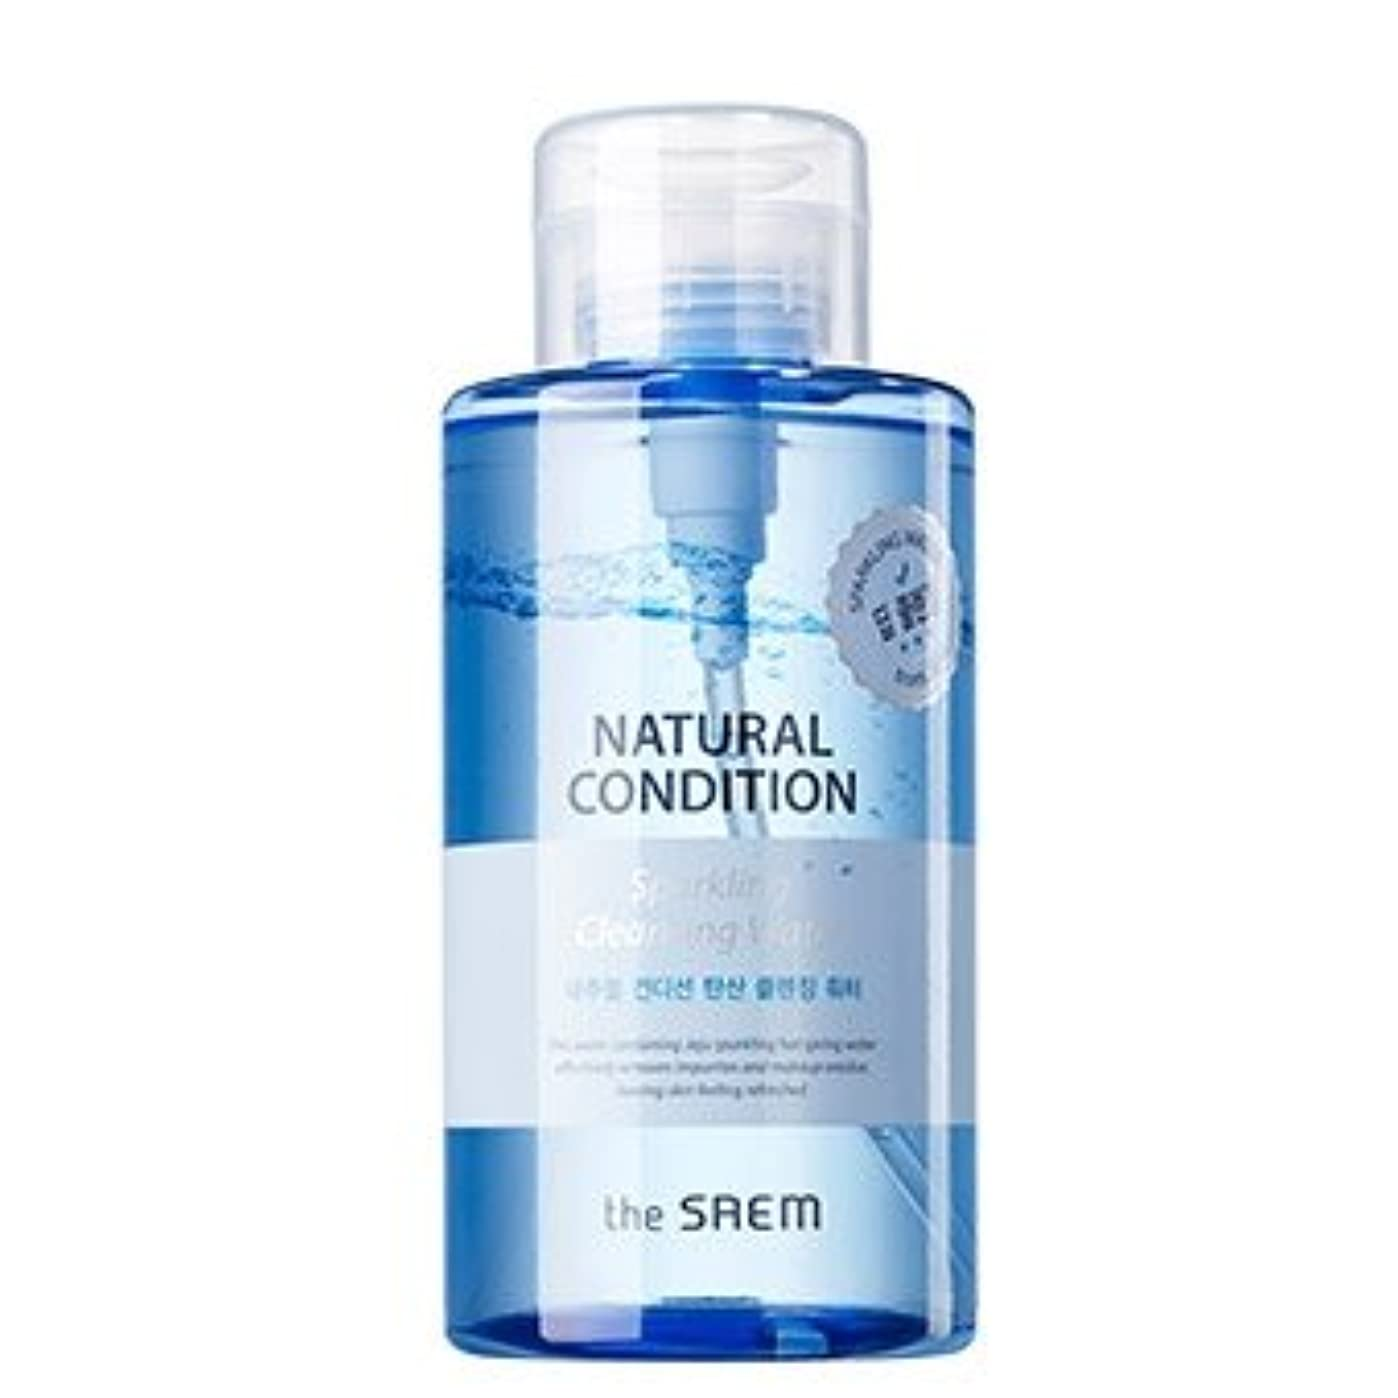 the SAEM Natural Condition Sparkling Cleansing Water 500ml/ザセム ナチュラル コンディション スパークリング クレンジングウォーター 500ml [並行輸入品]